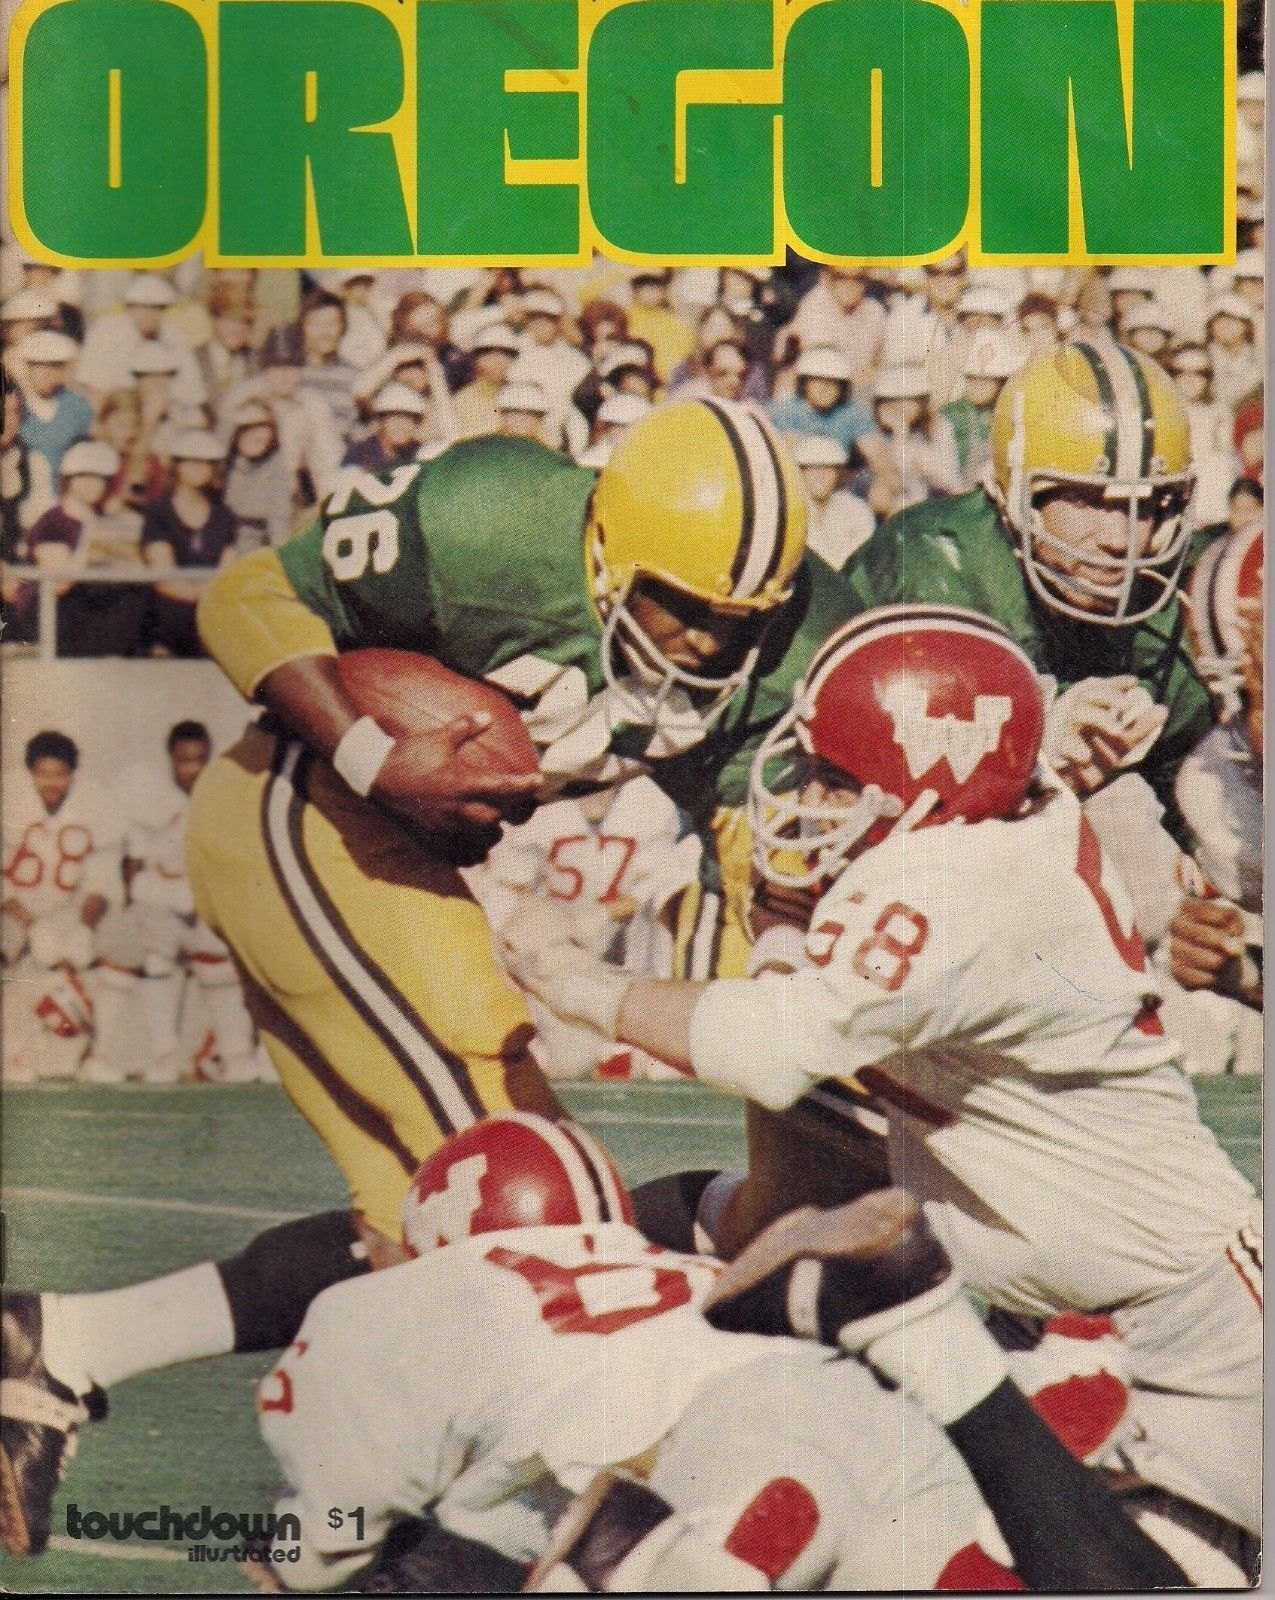 Oregon University 1973 Touchdown Illustrated Magazine